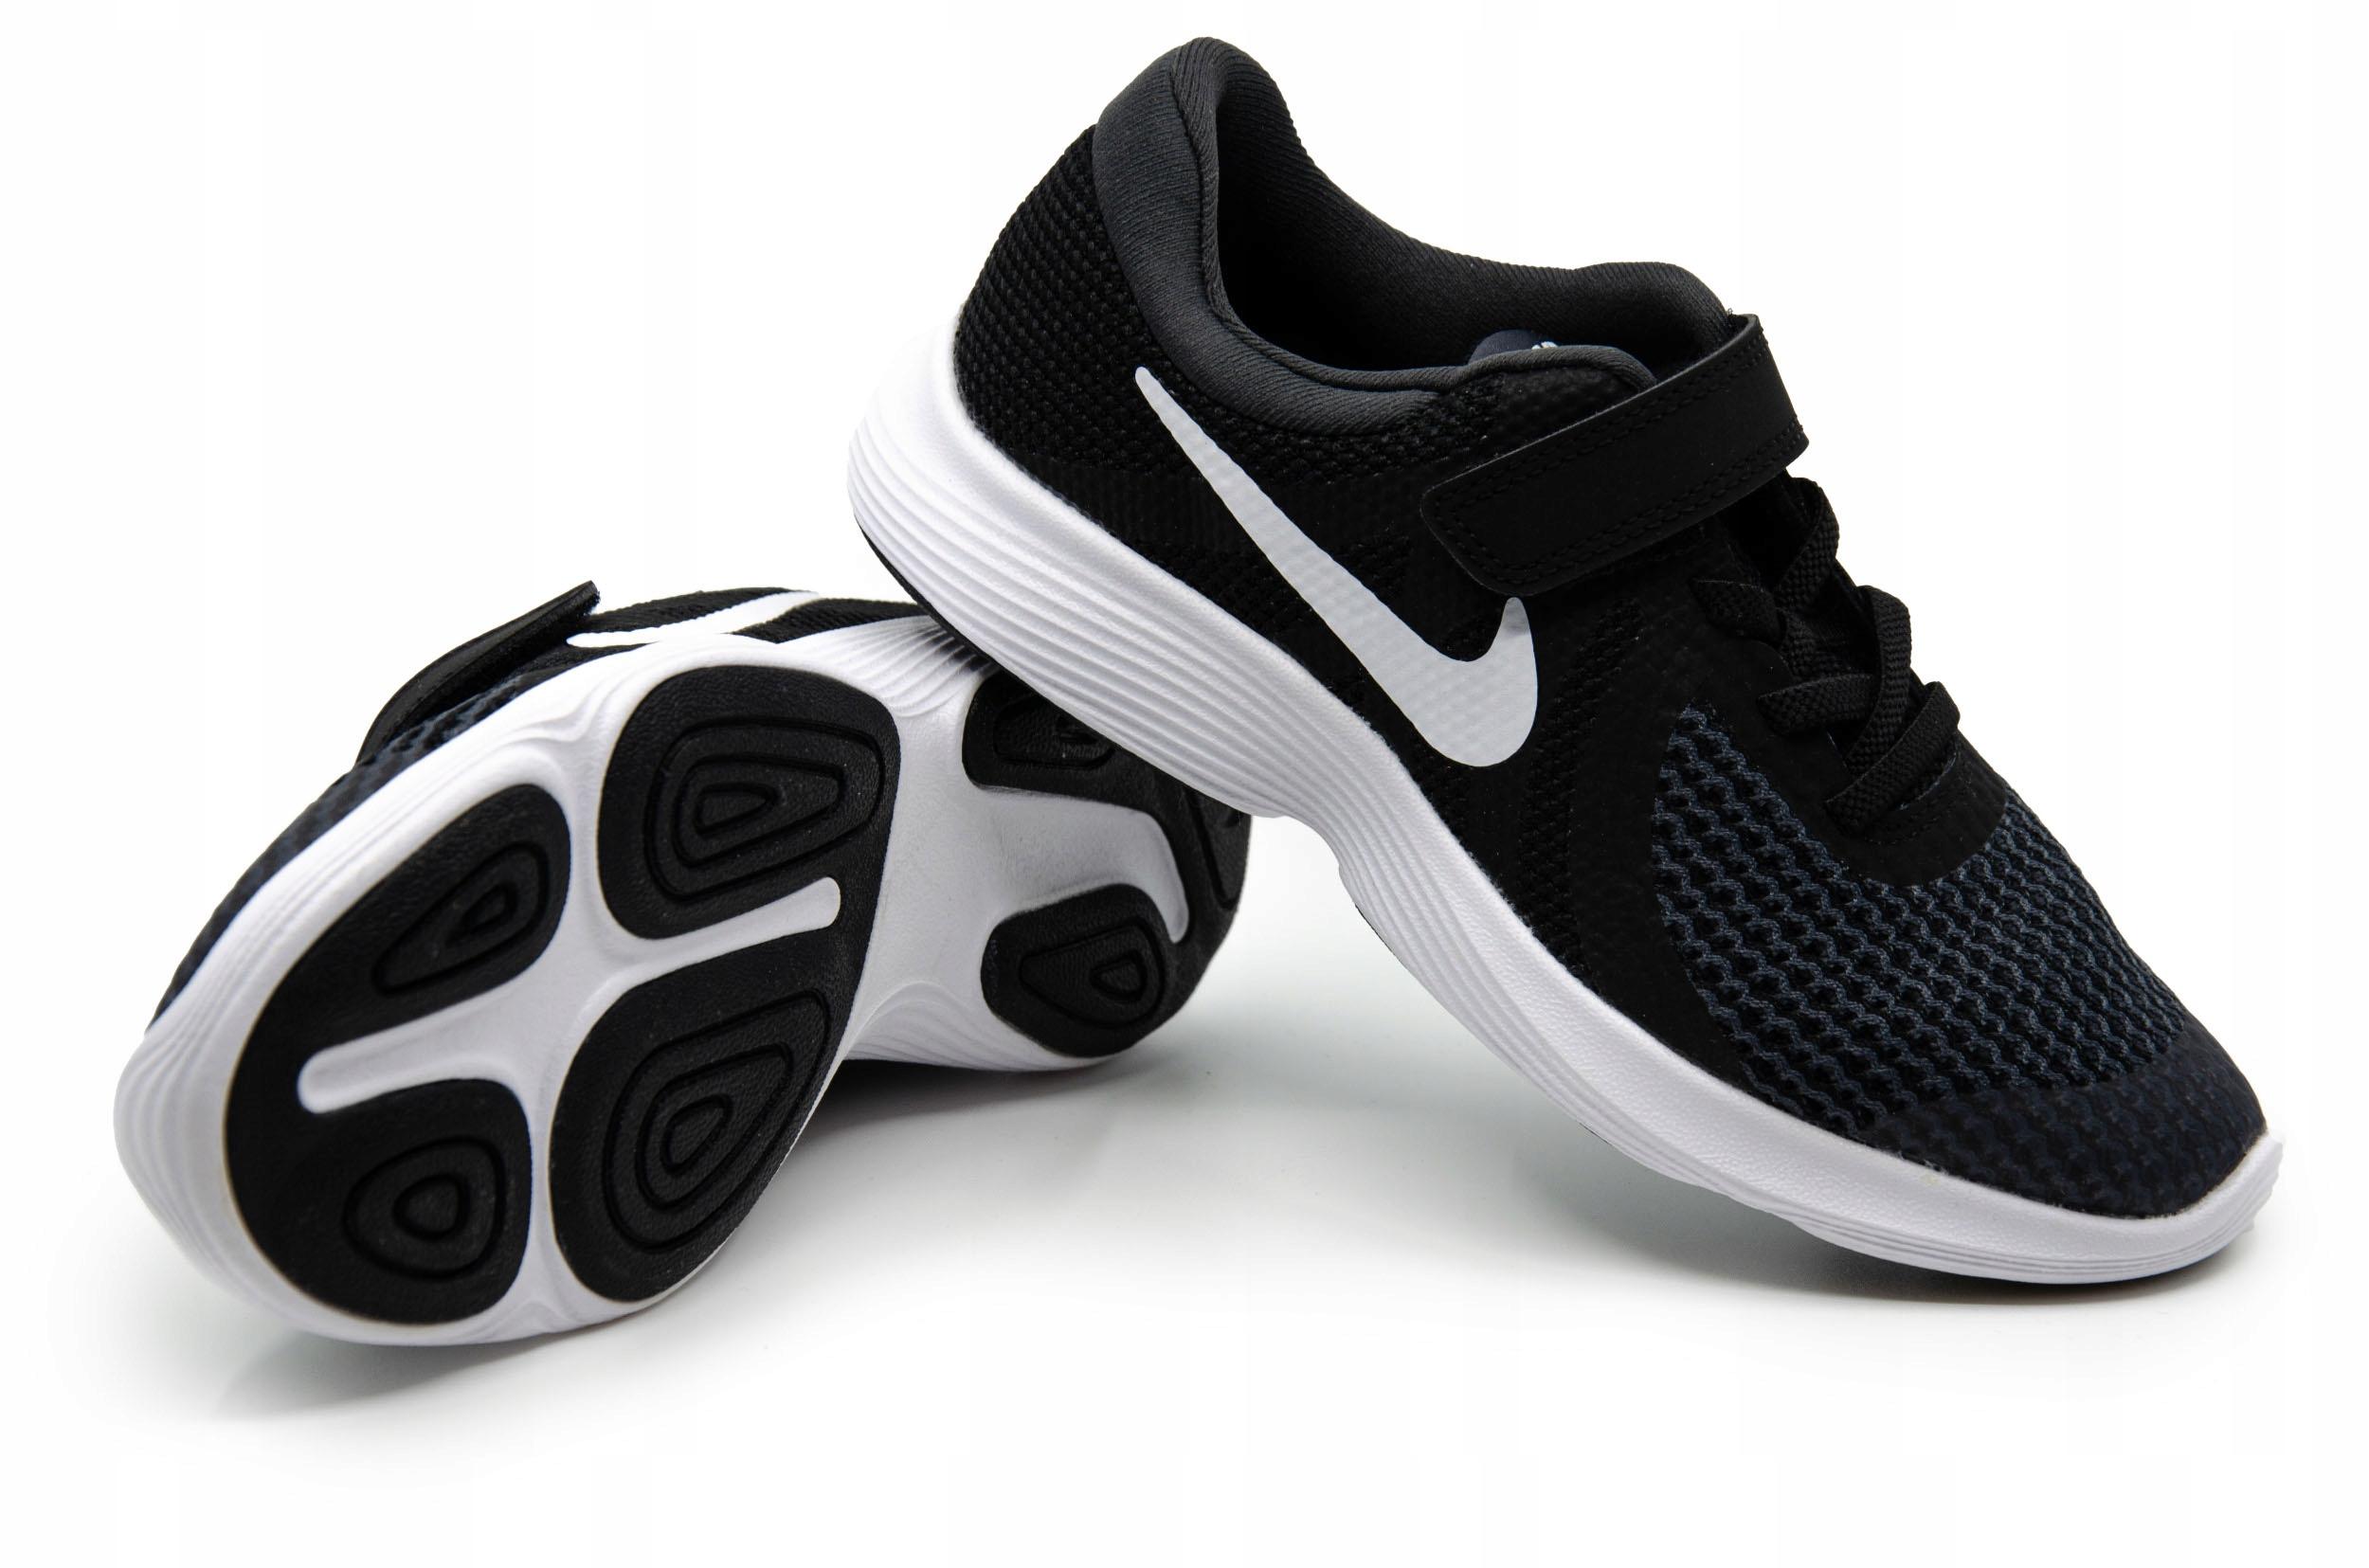 Buty Dzieciece Nike Revolution 4 943305 006 R 27 5 9553114372 Allegro Pl